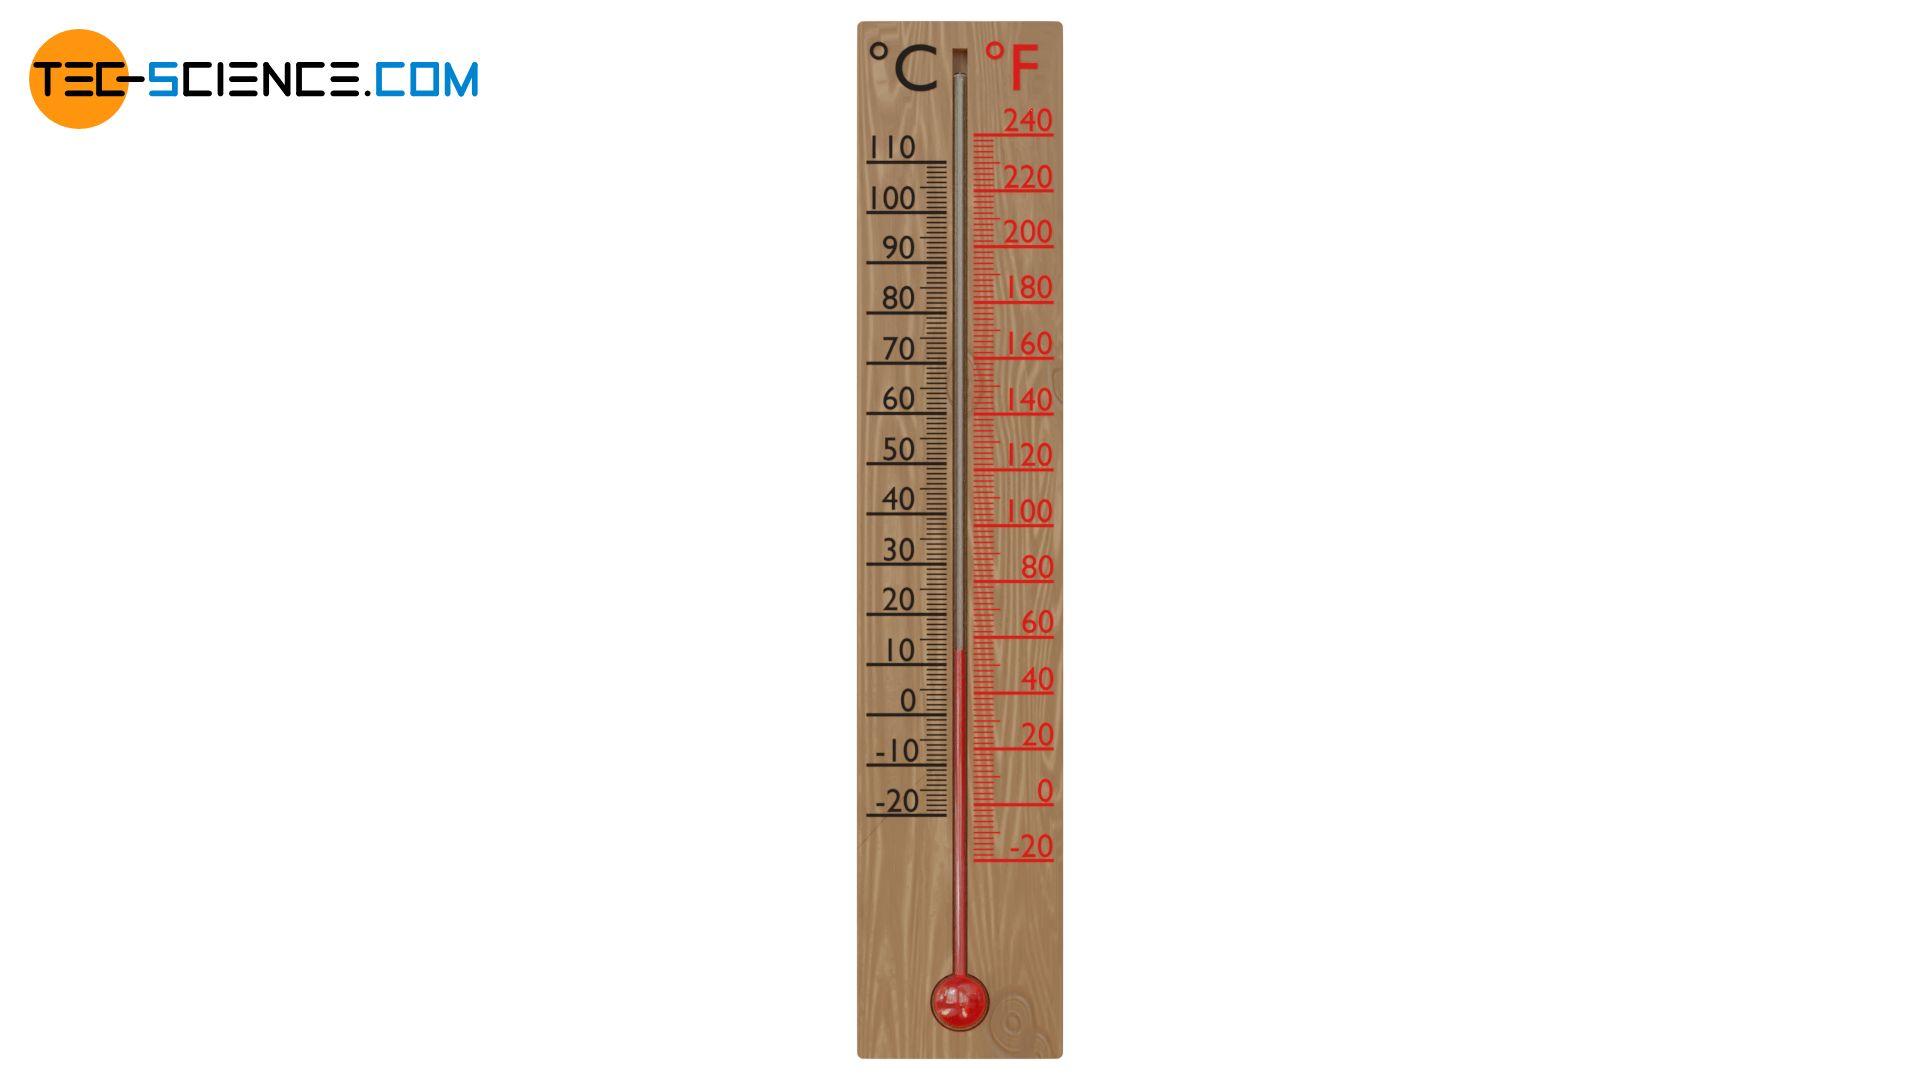 Celsius and Fahrenheit scale in comparison